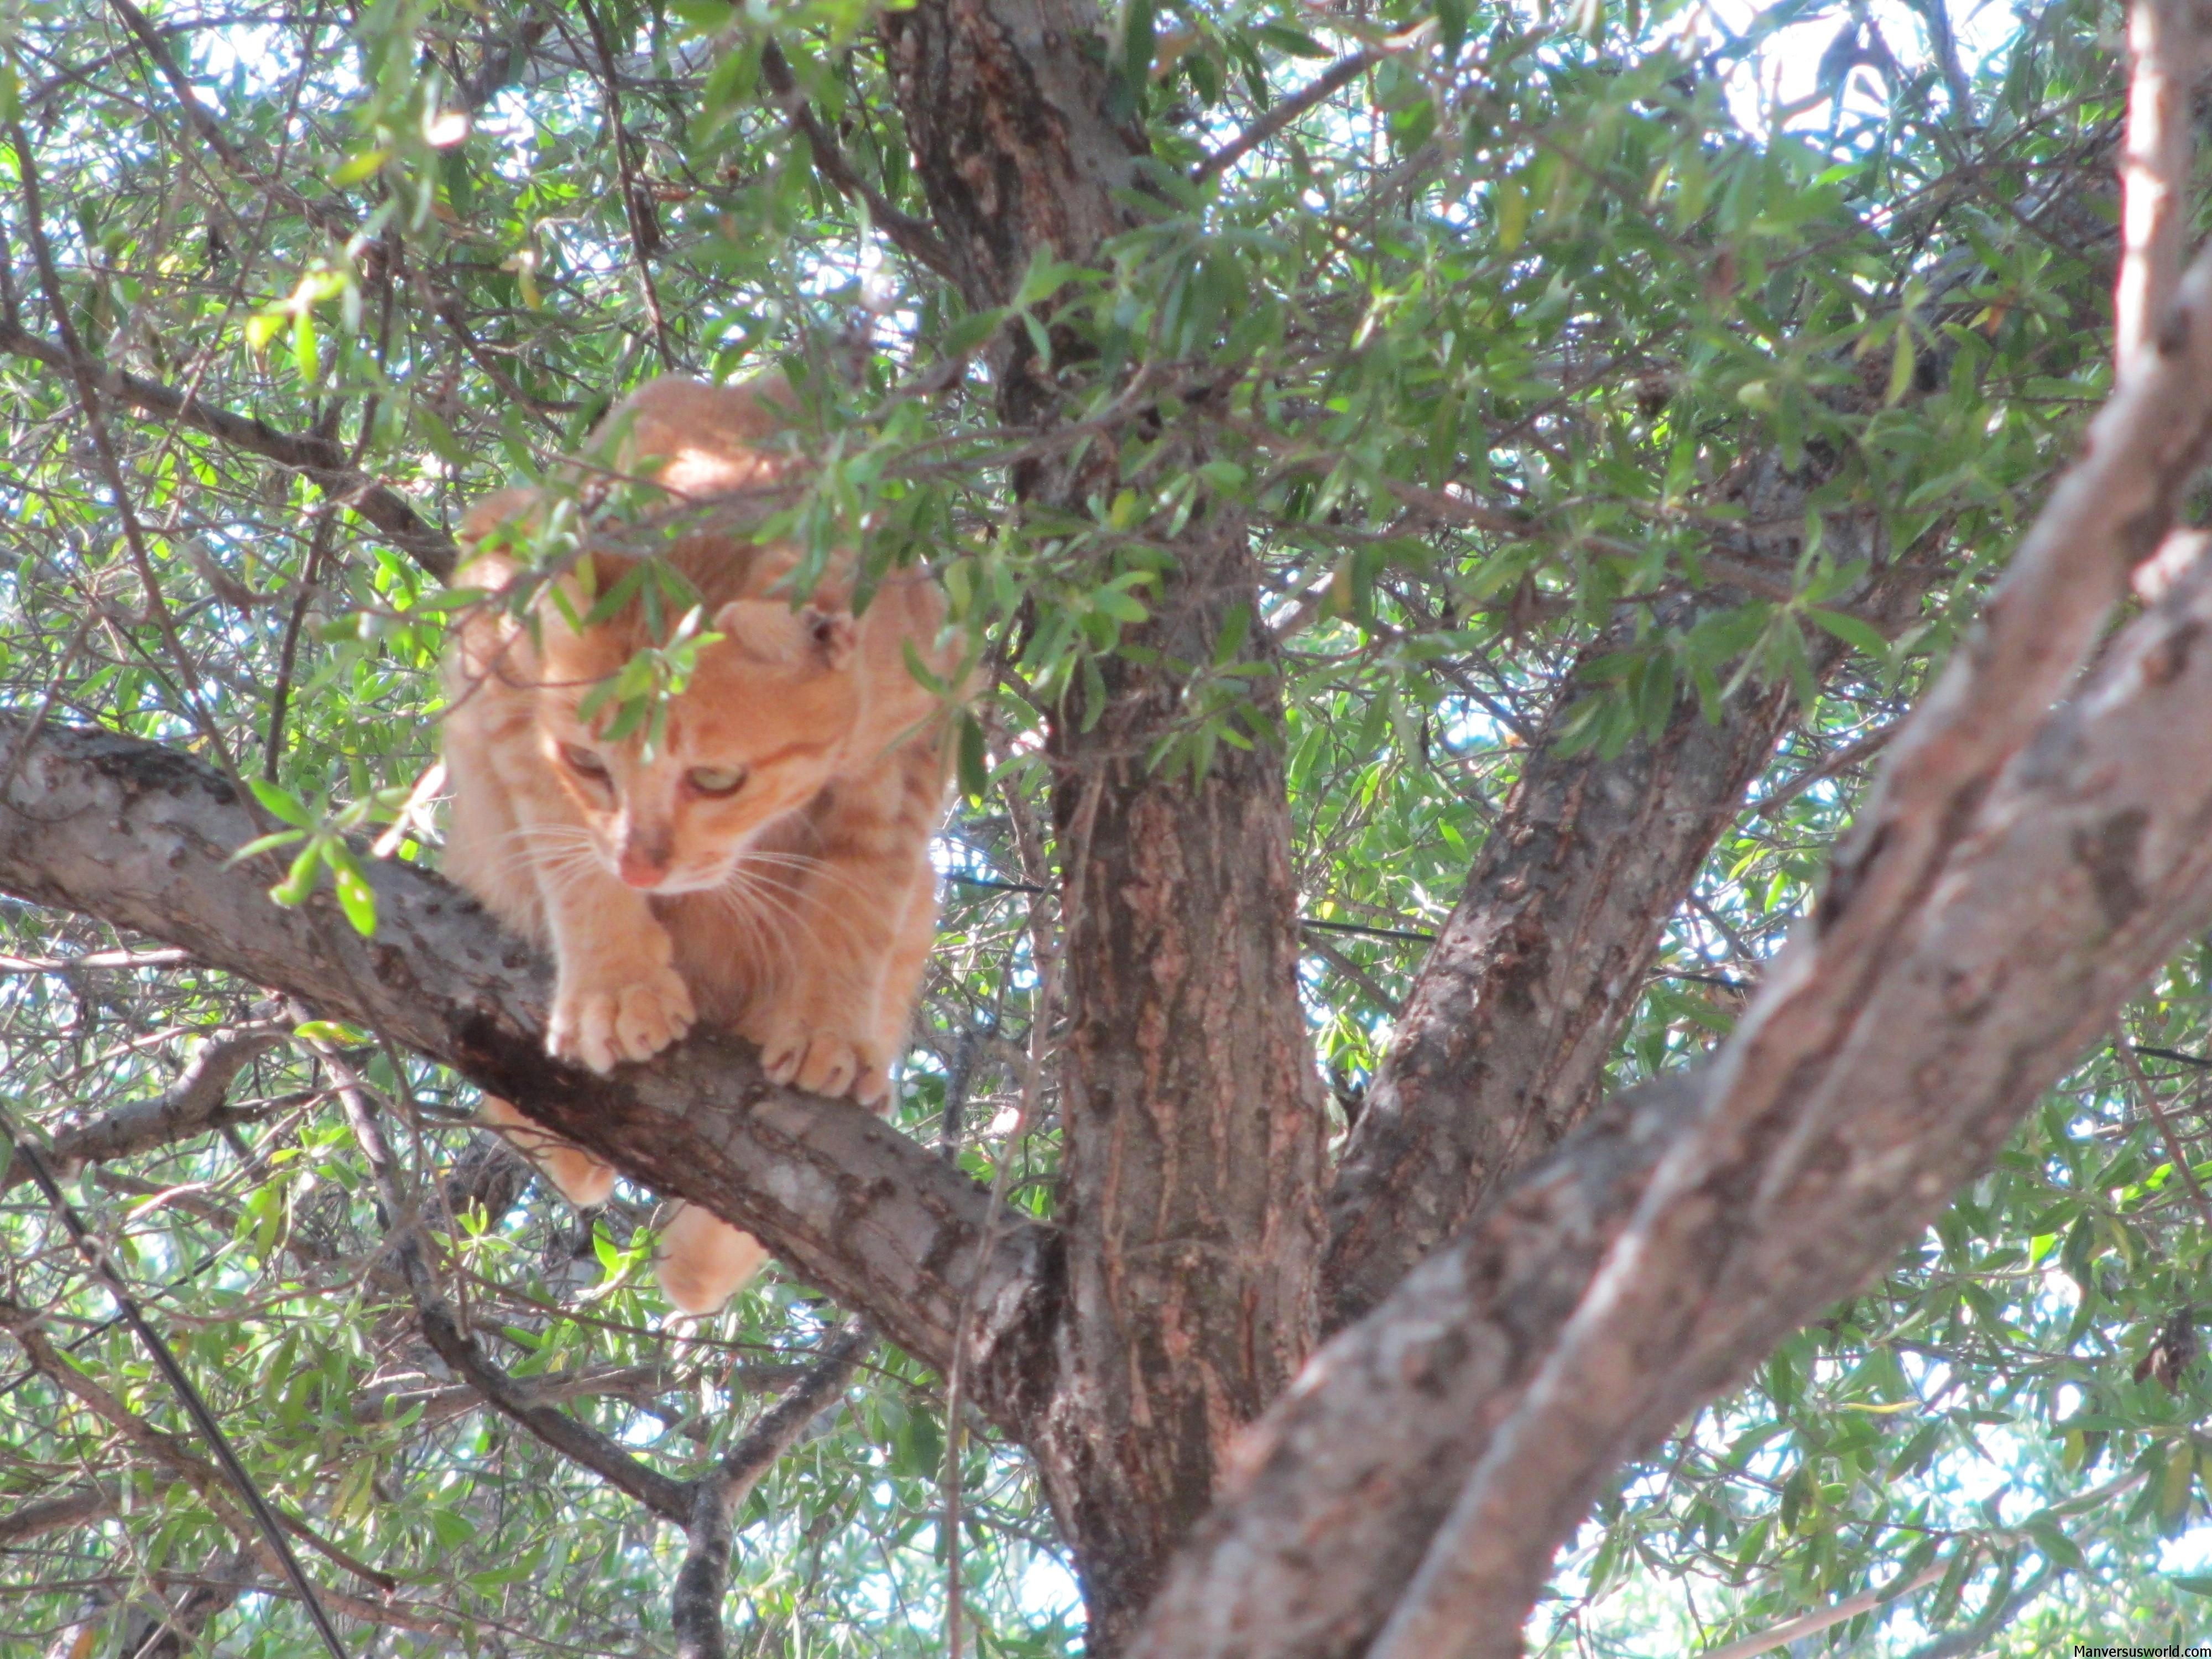 A cat up a tree in Gili Trawangan, Indonesia